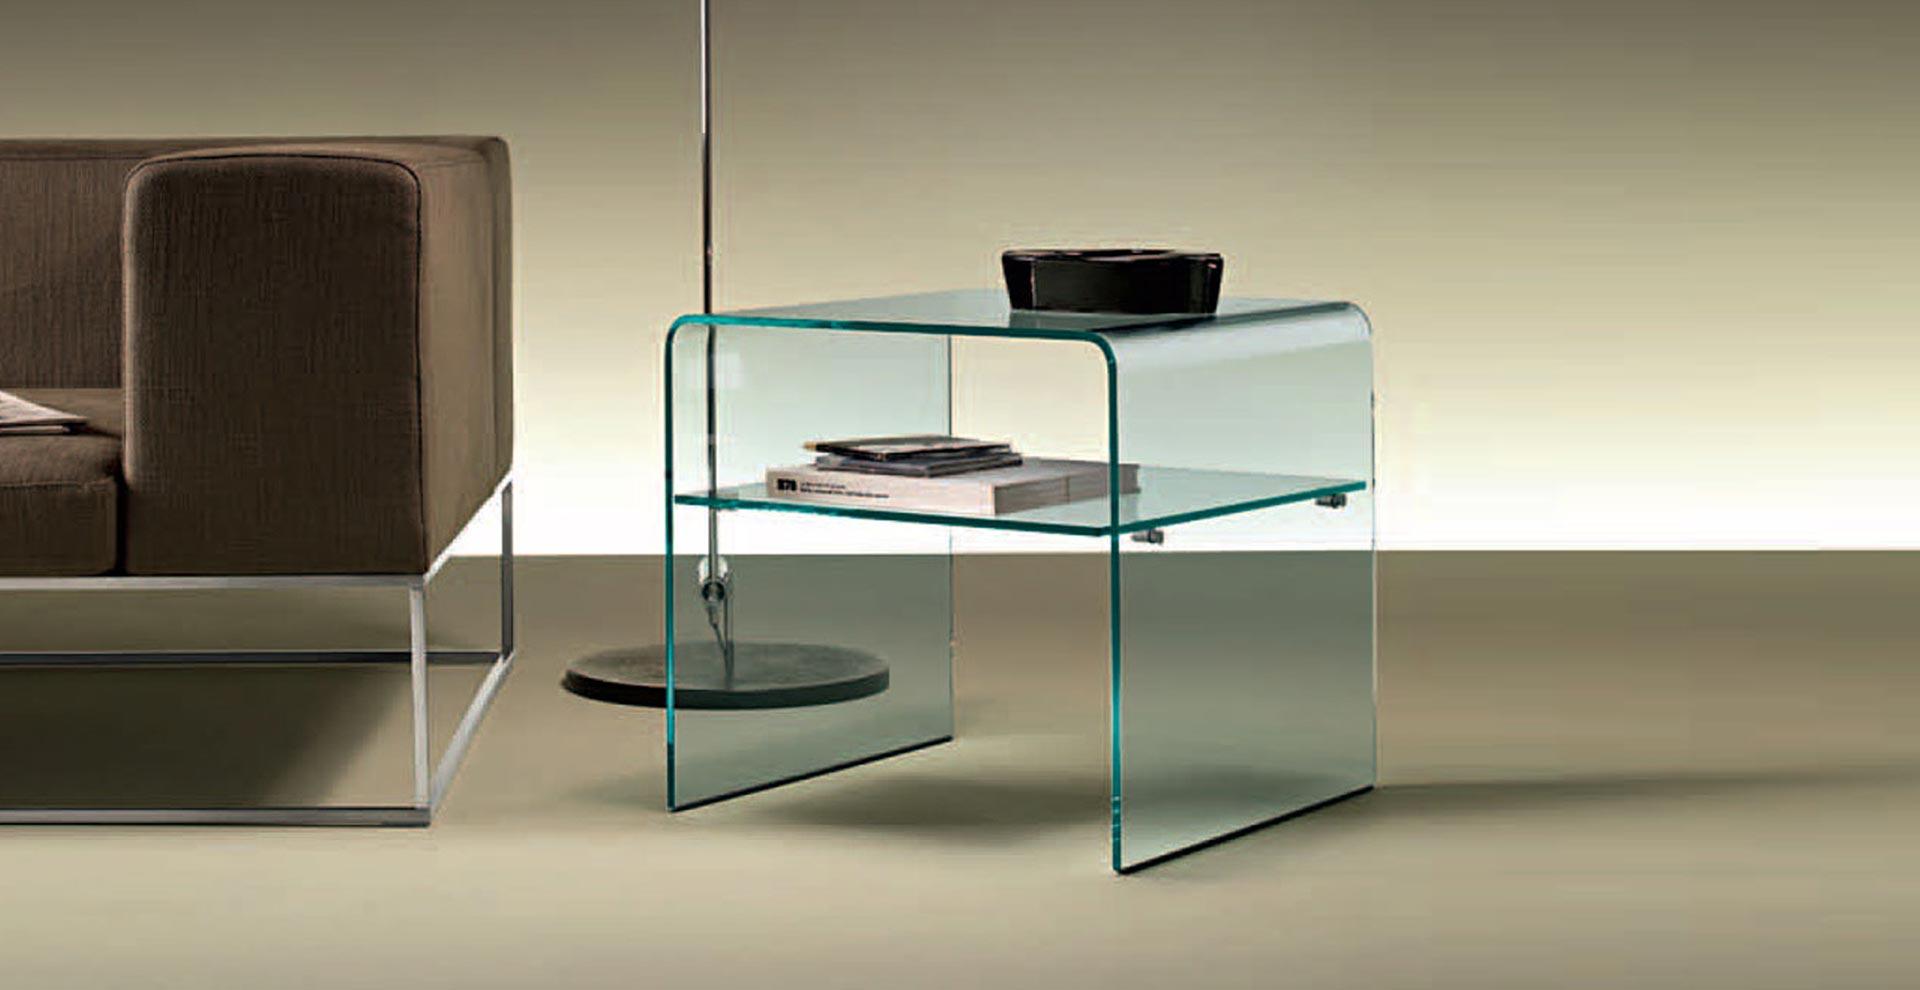 rialto night fiam italia. Black Bedroom Furniture Sets. Home Design Ideas